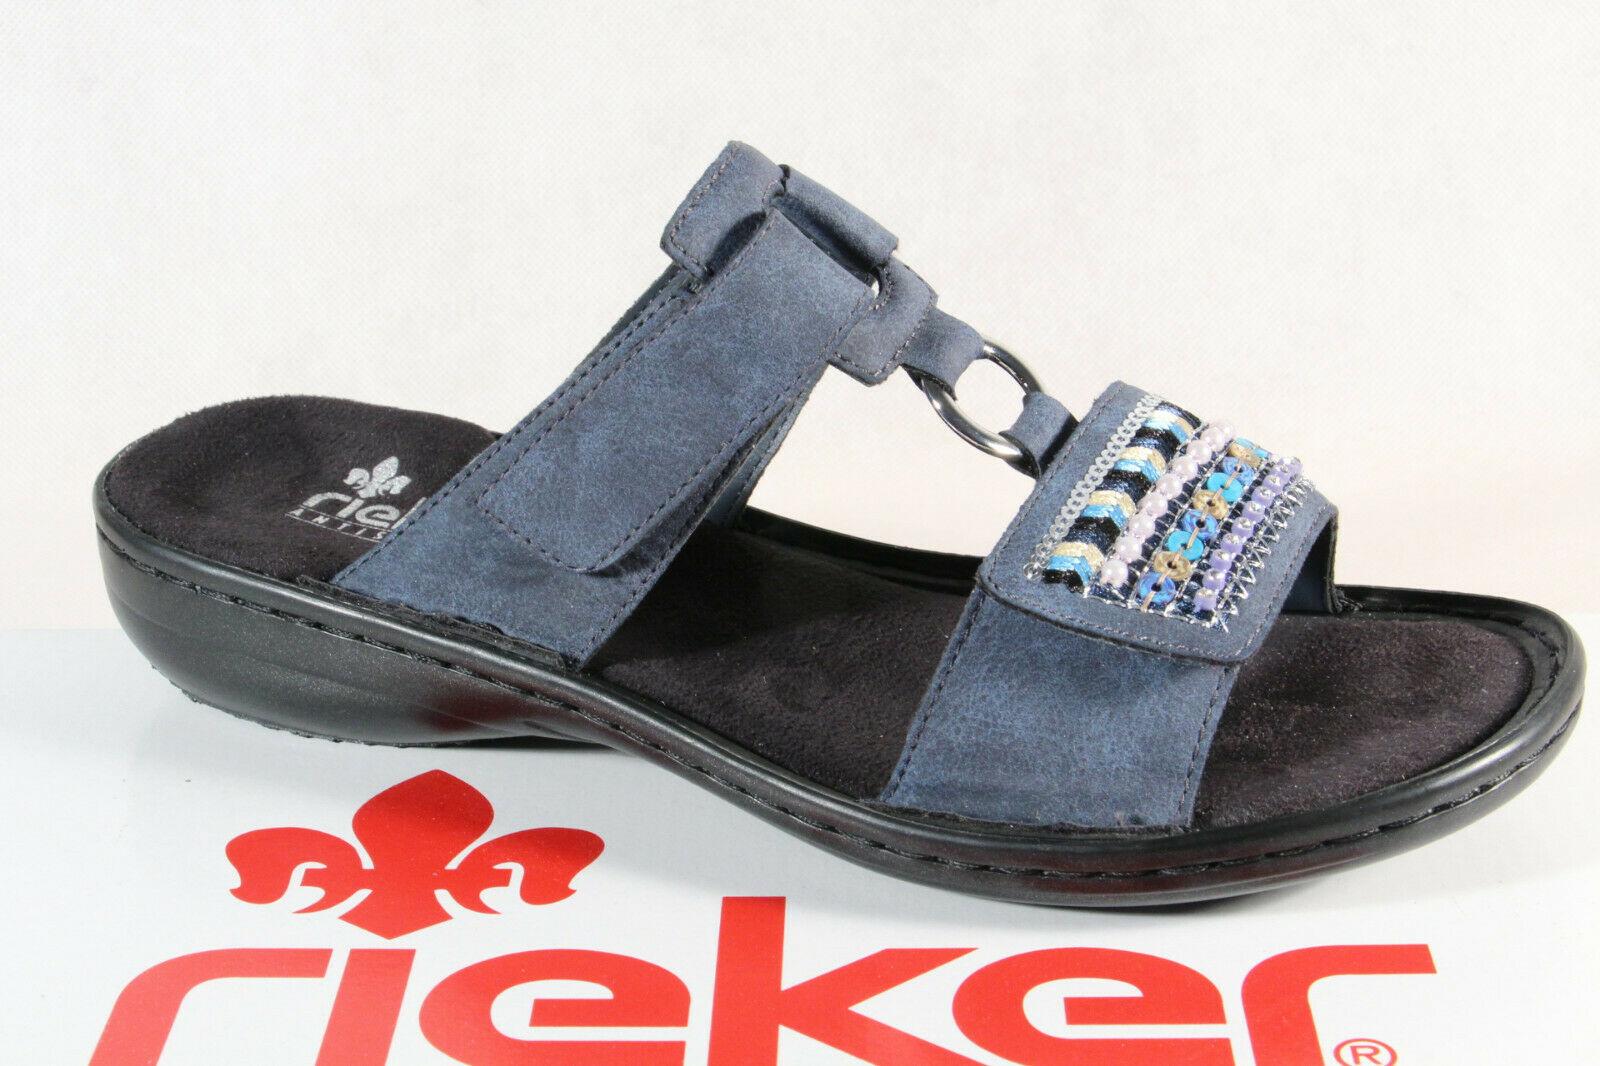 Rieker Damen Pantolette Pantoletten Pantoffel Hausschuhe blau 608P6 NEU!